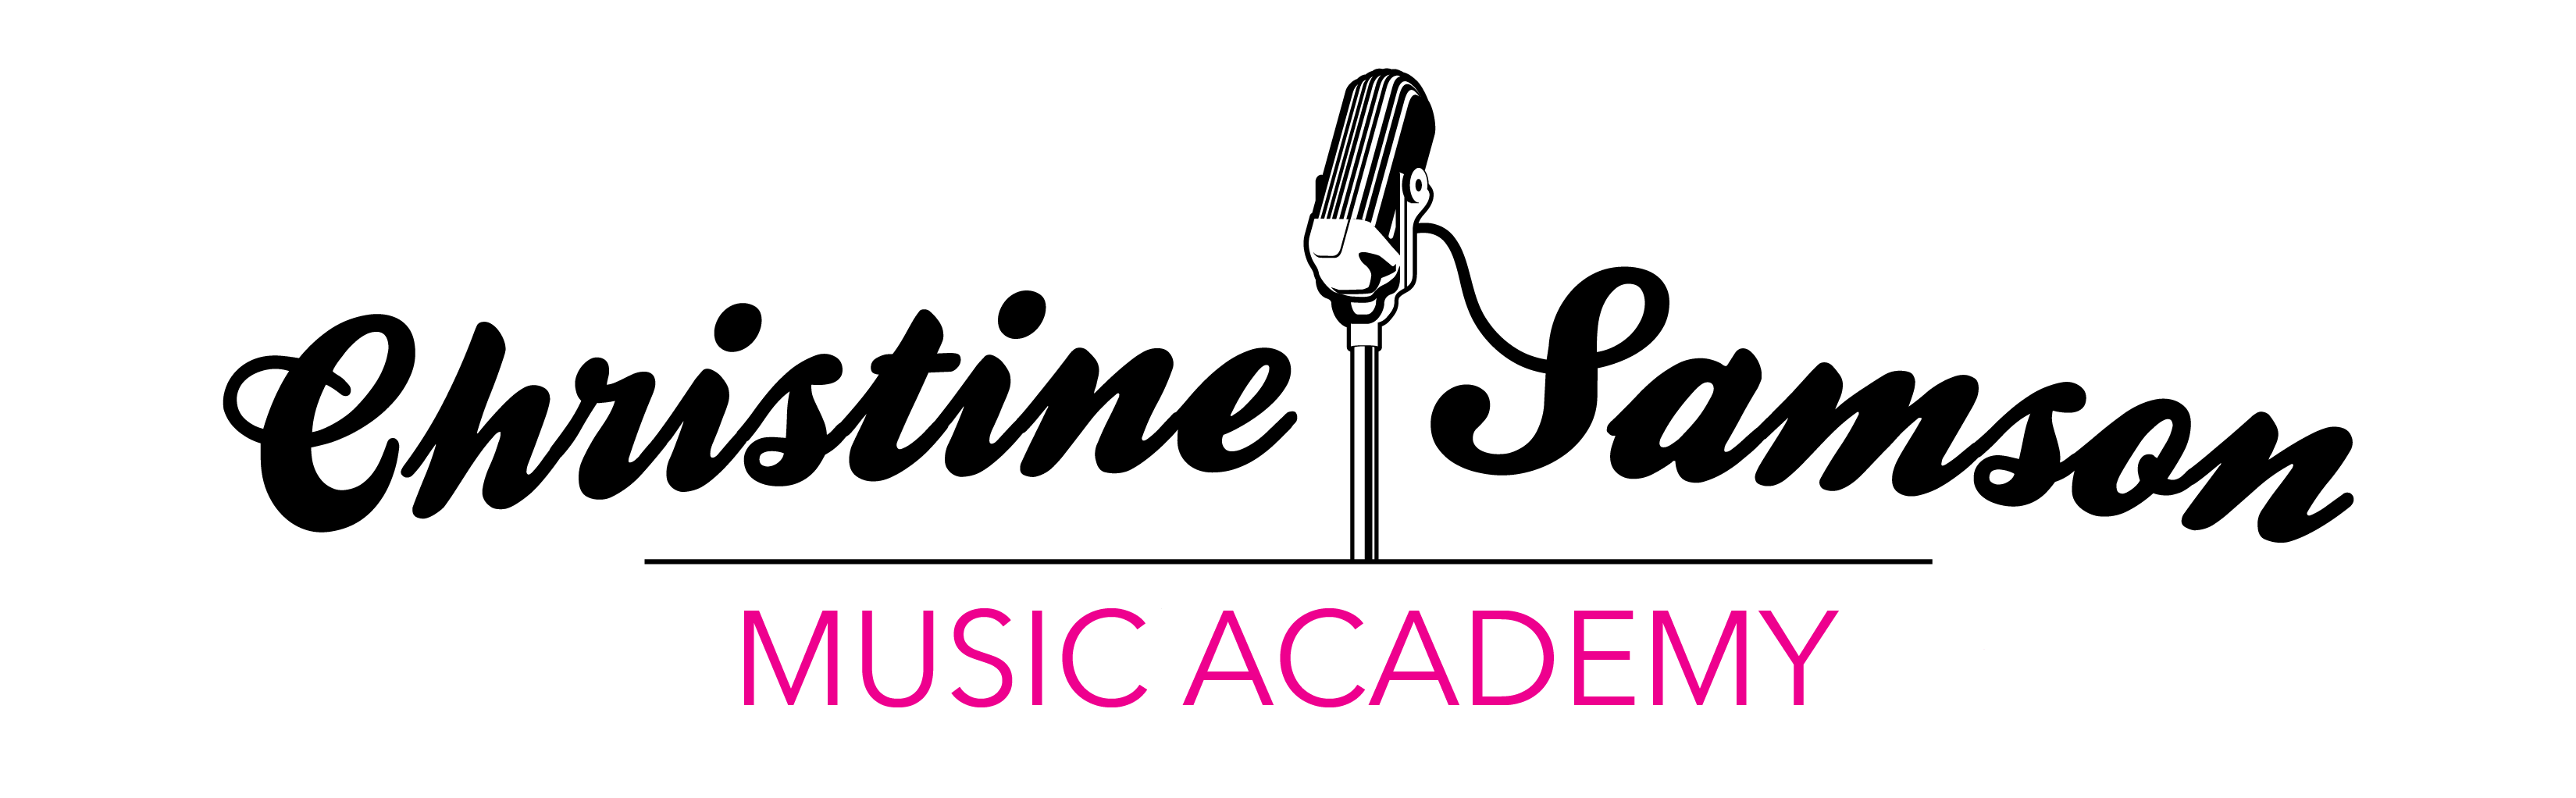 Christine Samson Music Academy